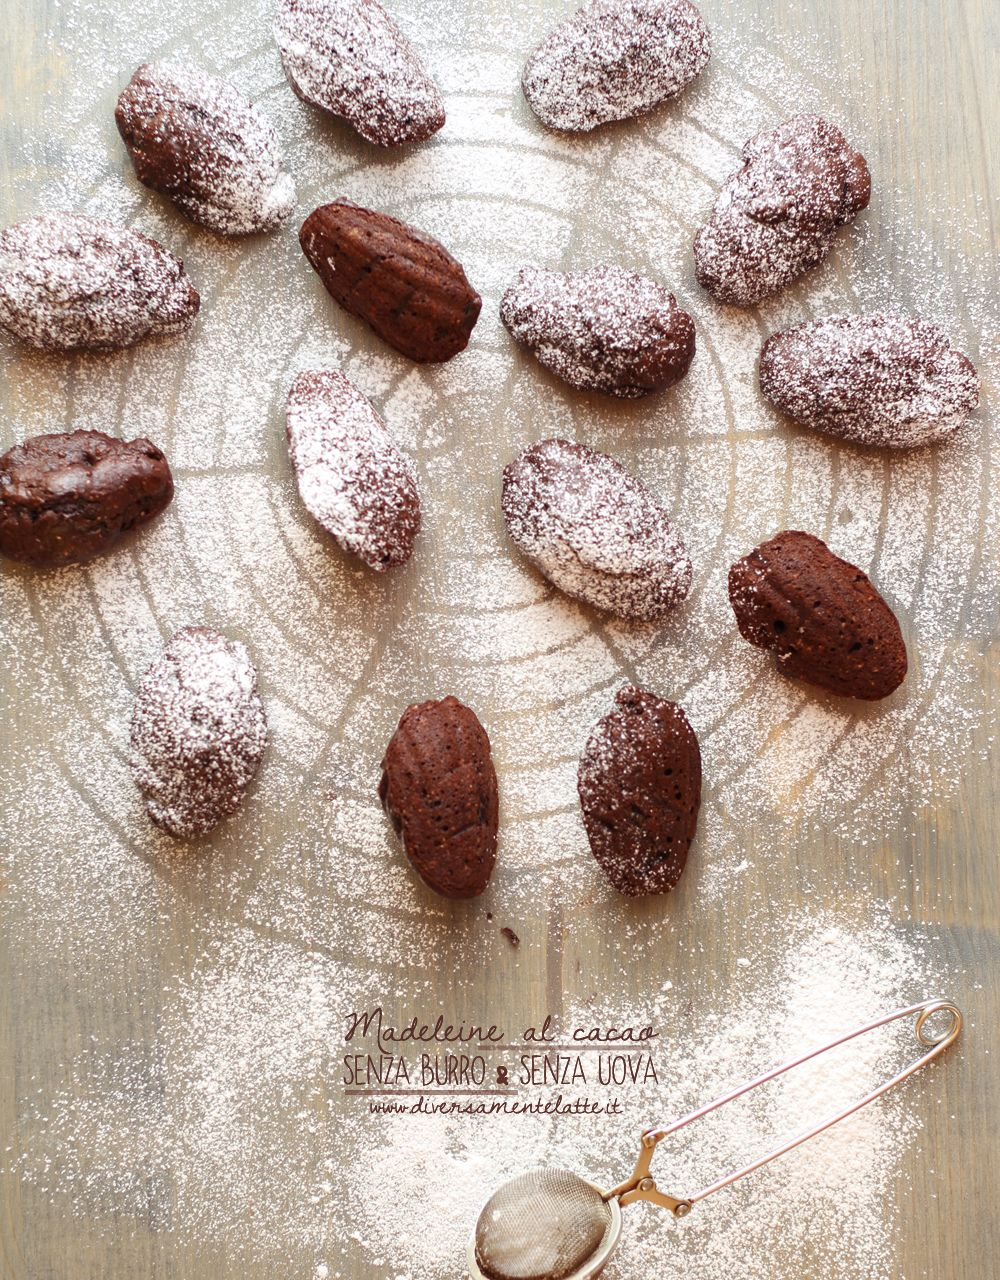 madeleine senza lattosio http://www.diversamentelatte.it/madeleine-al-cacao-senza-burro-e-senza-uova/